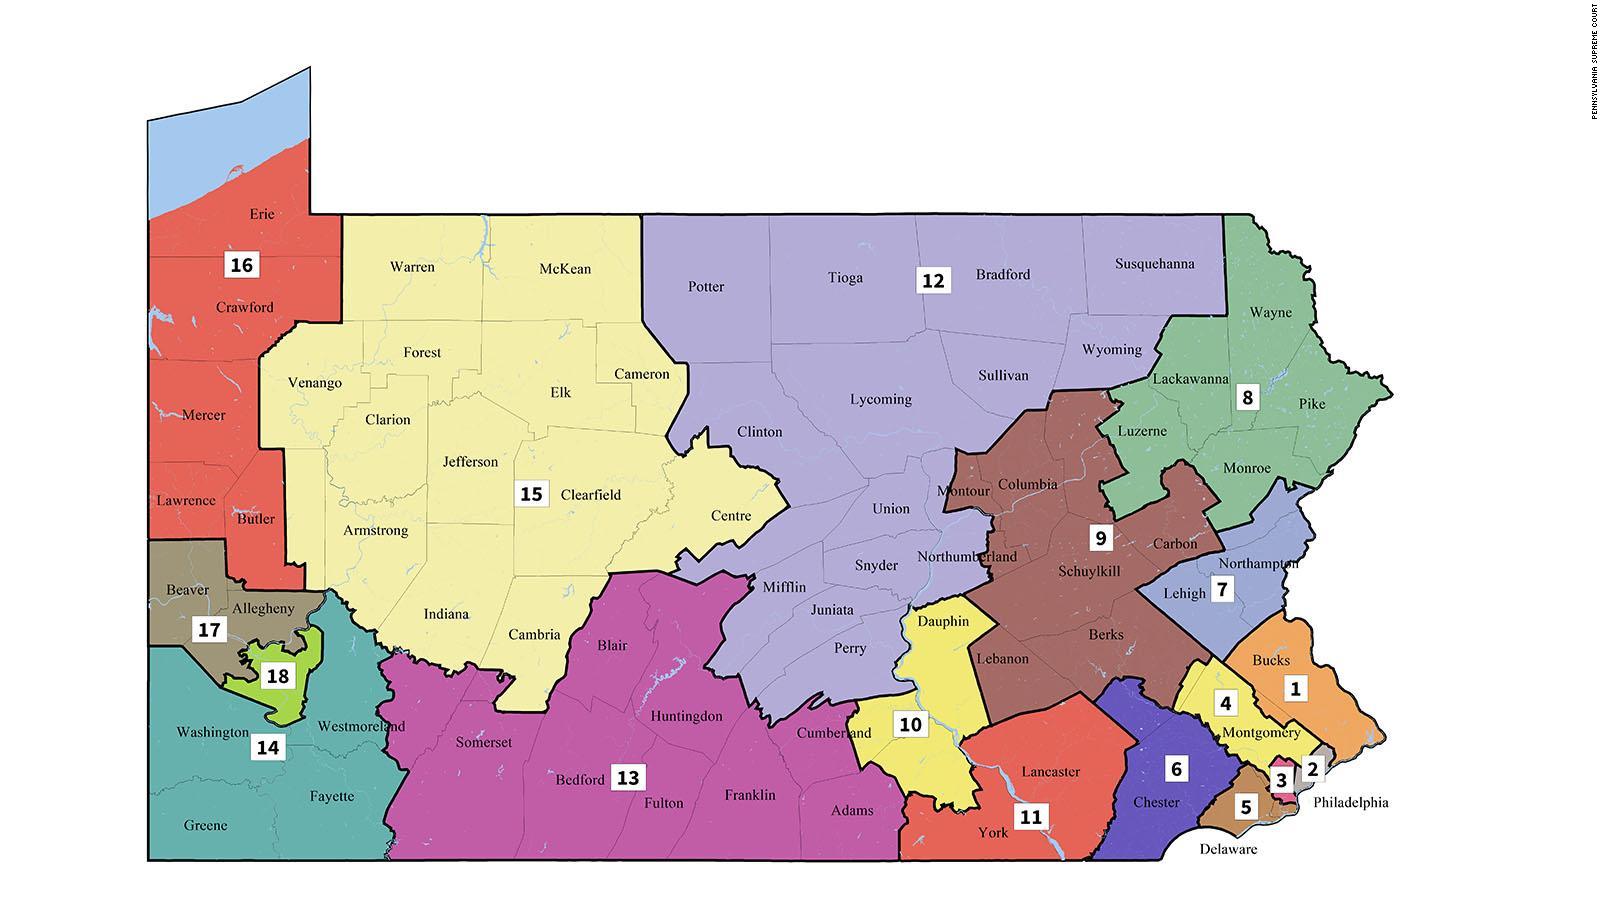 SCOTUS rejects GOP plea to block Pennsylvania maps - CNNPolitics